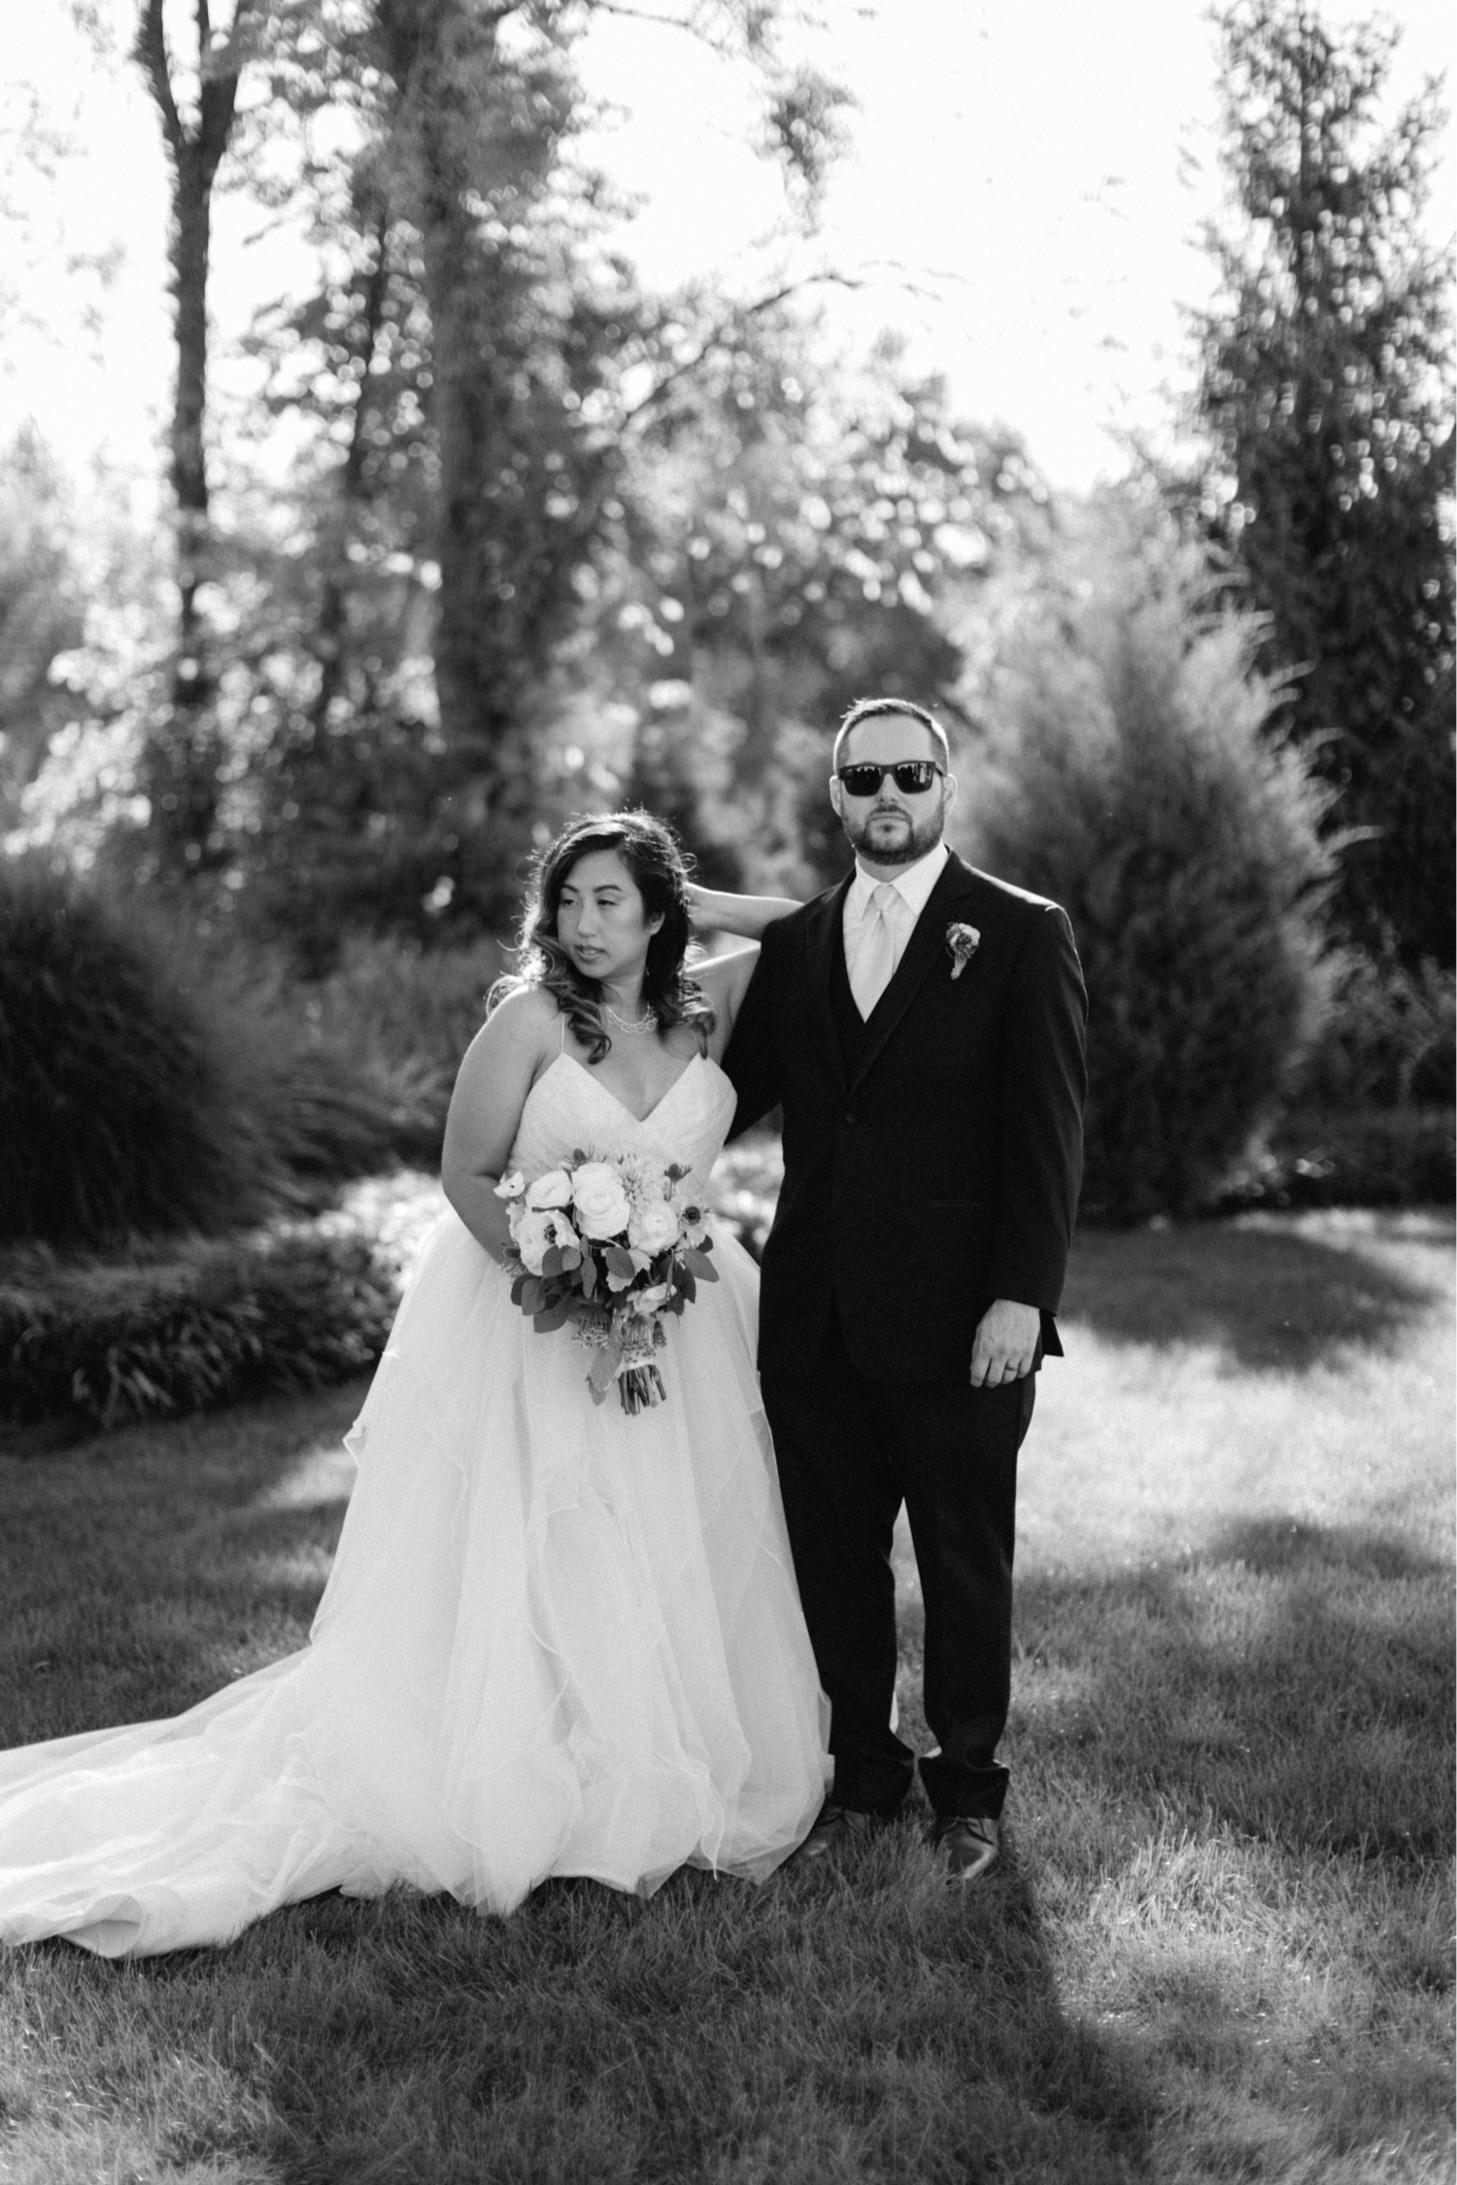 ritz-charles-wedding-reception-downtown-indianapolis-wedding-photographer014.JPG